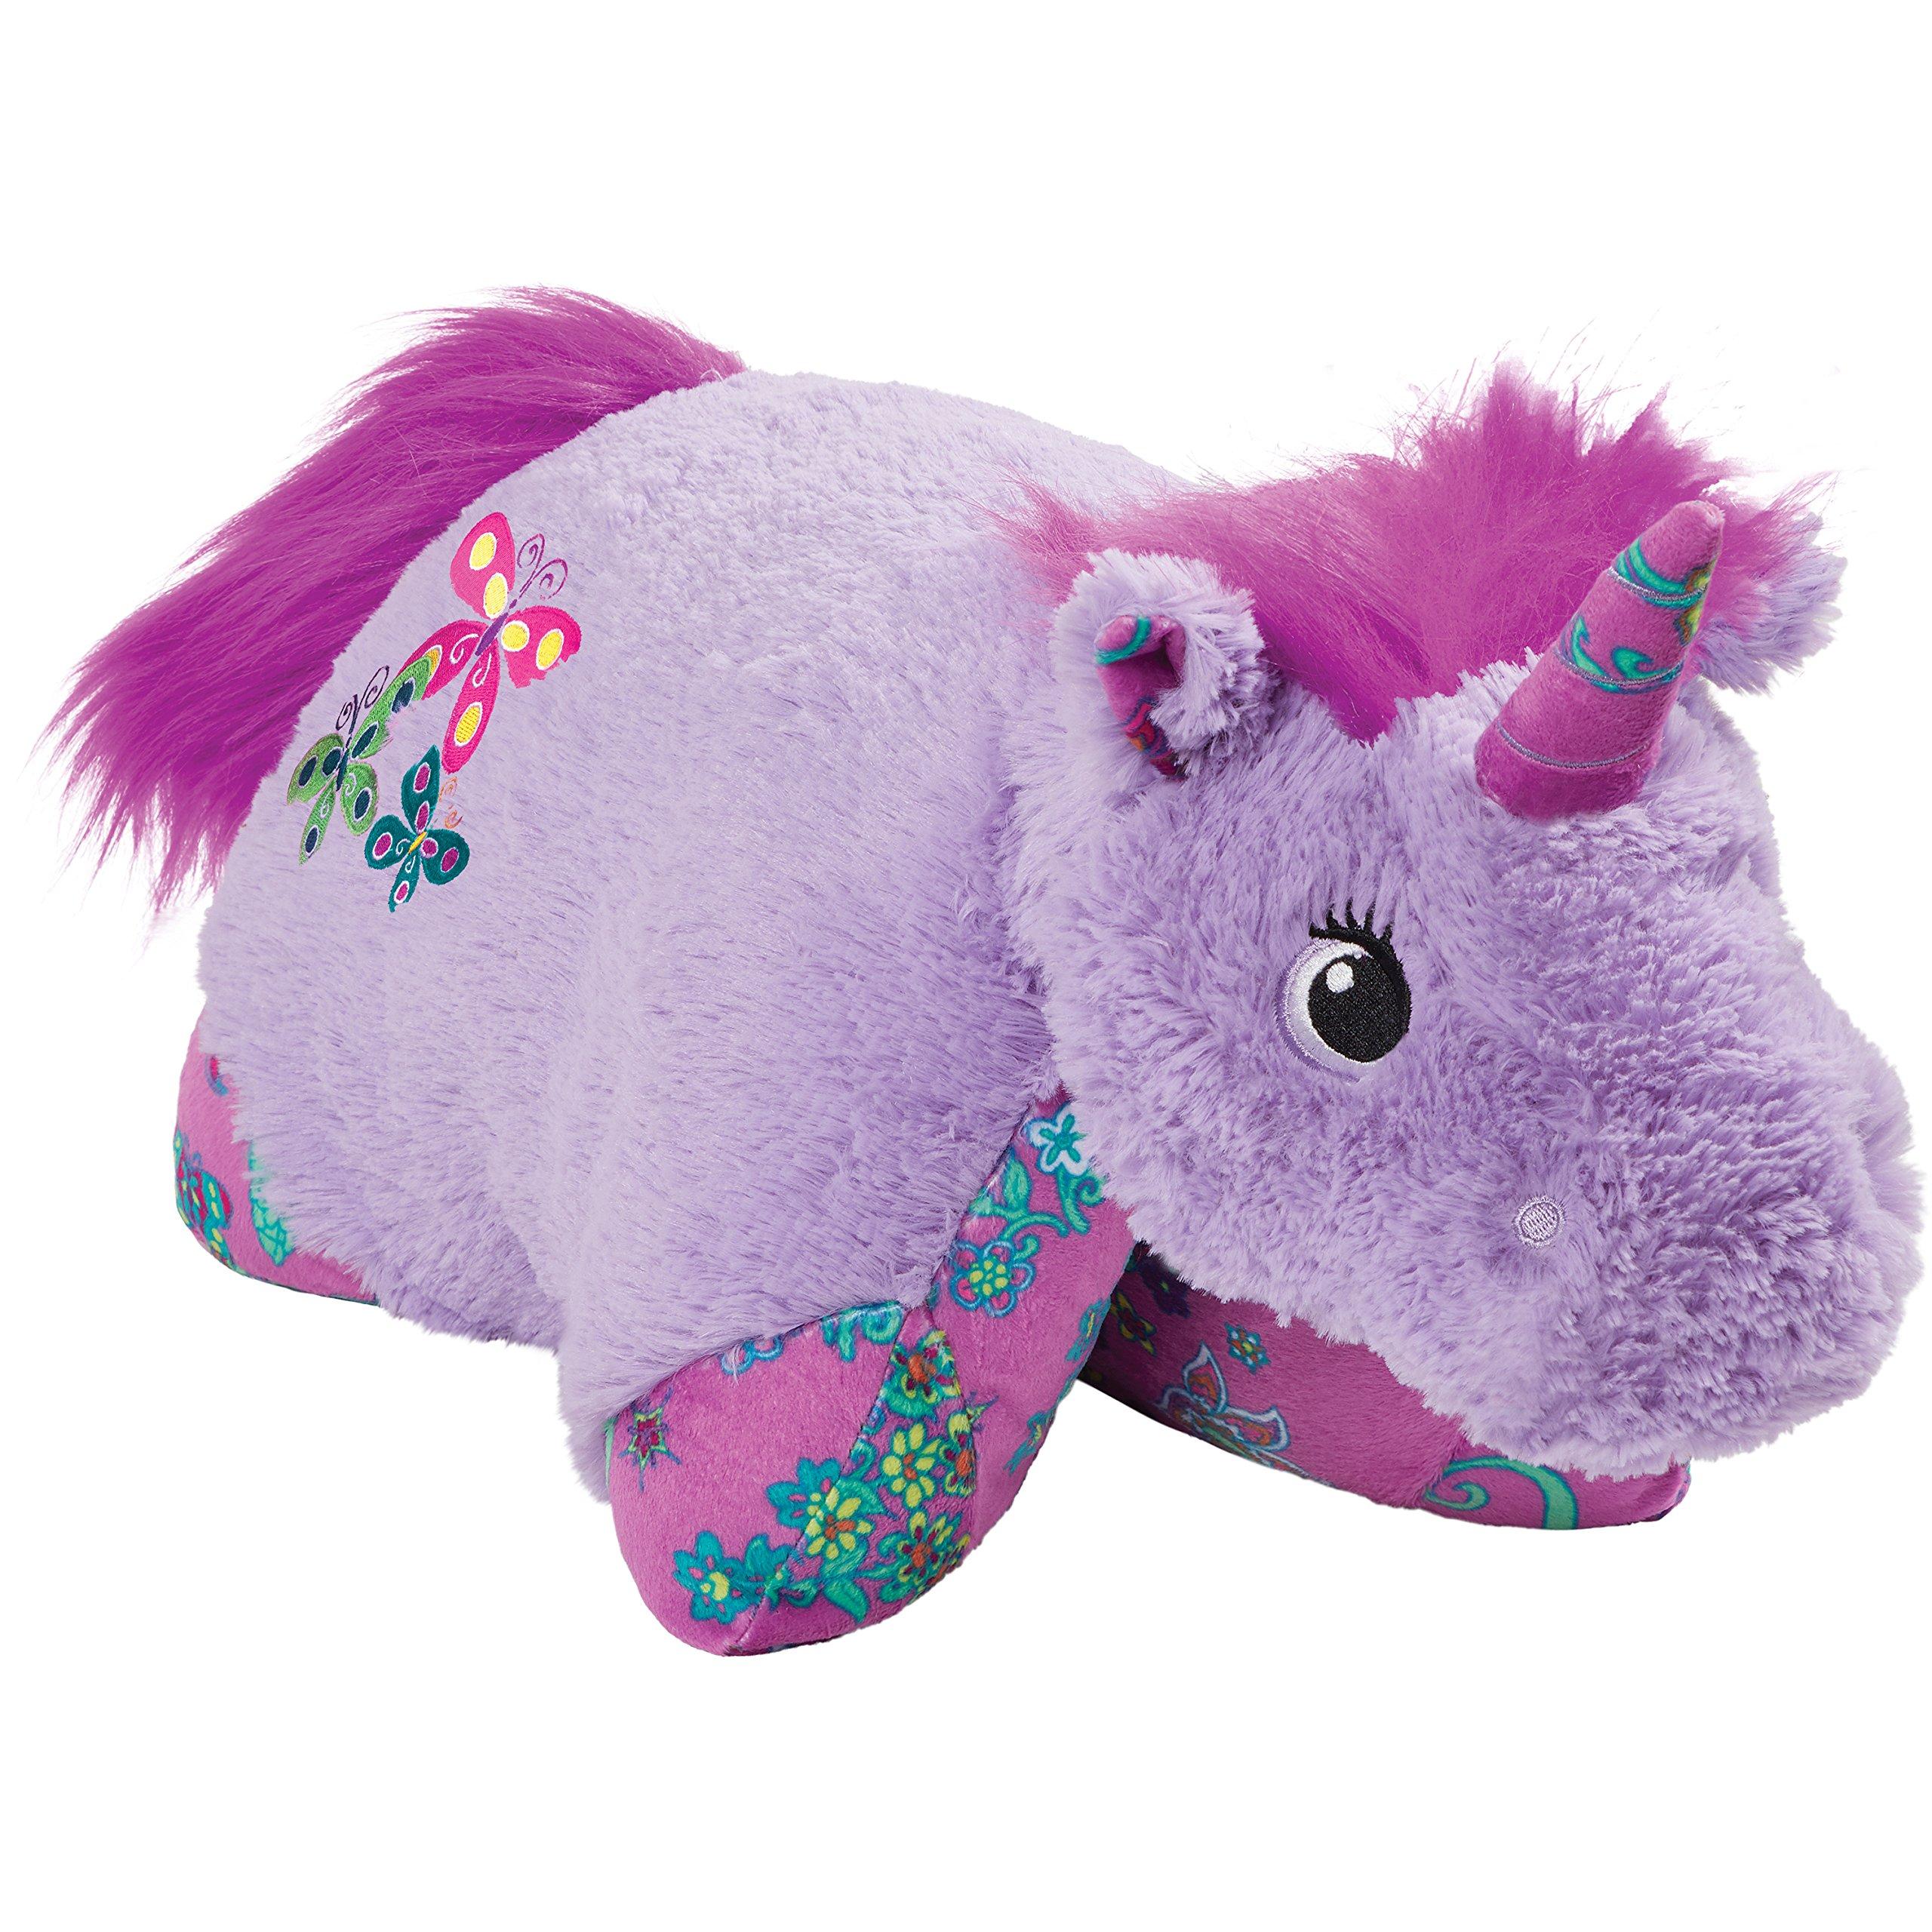 Pillow Pets Colorful Lavender Unicorn, 18'' Stuffed Animal Plush Toy